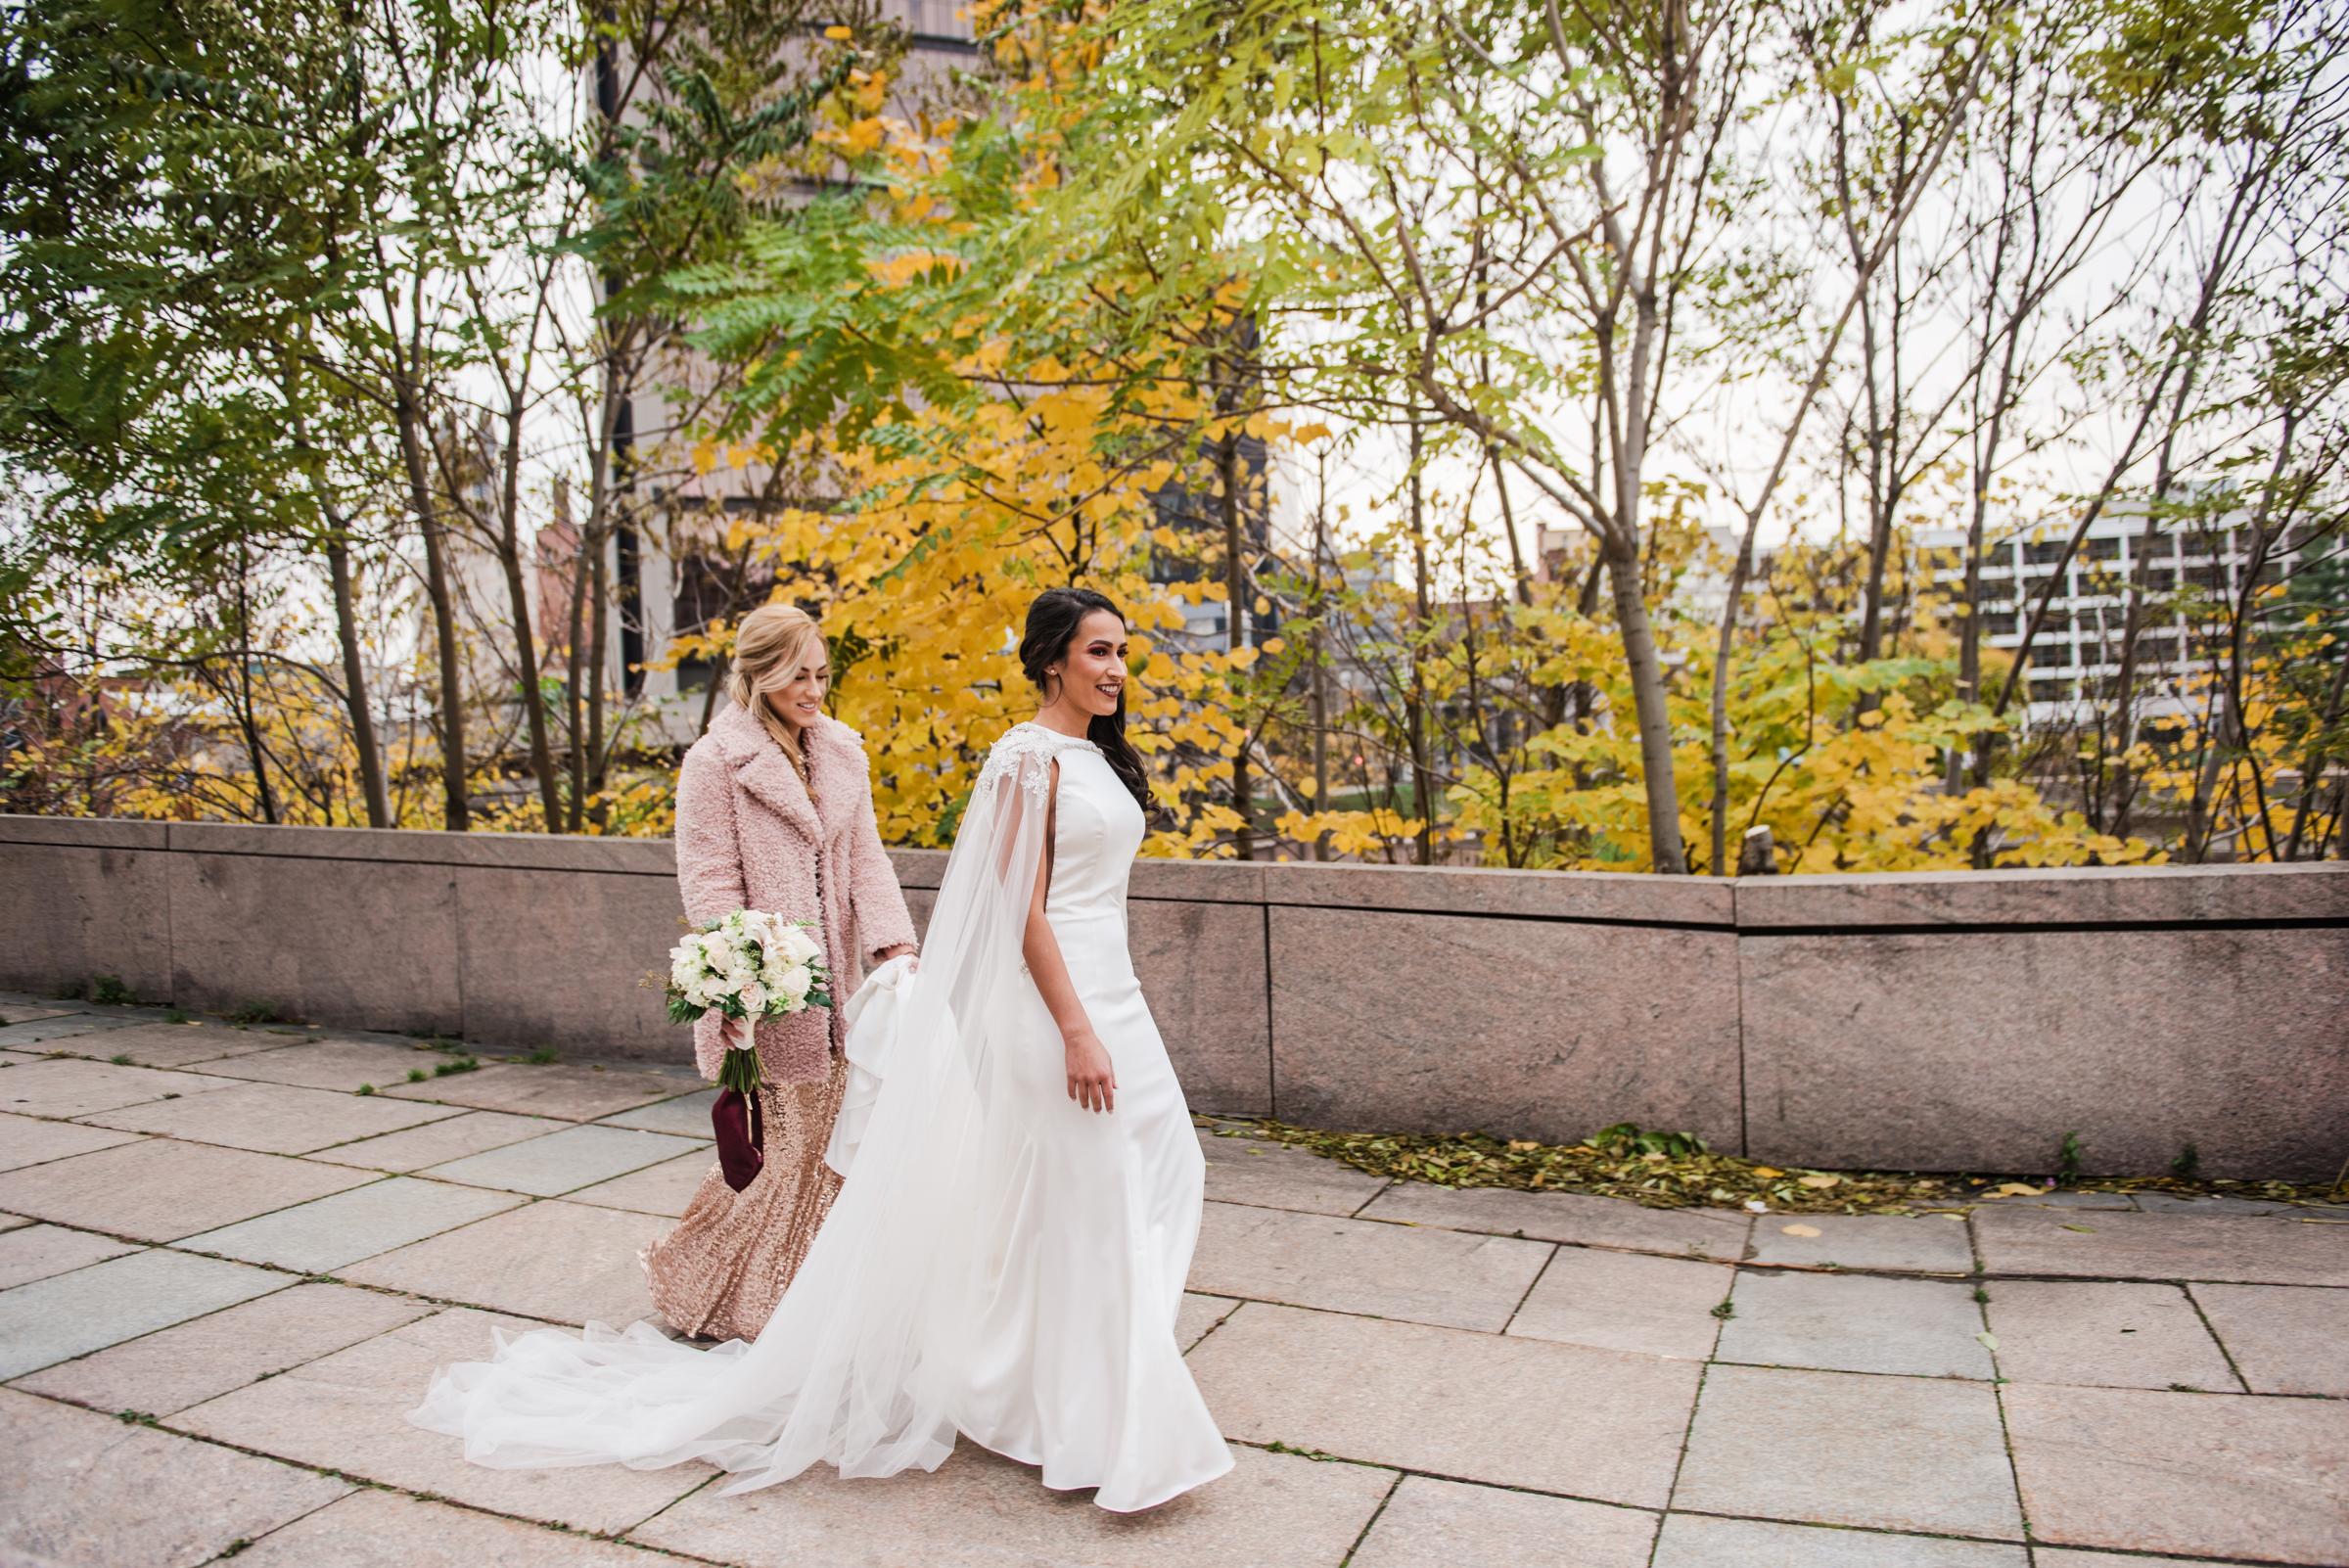 Wintergarden_by_Monroes_Rochester_Wedding_JILL_STUDIO_Rochester_NY_Photographer_163248.jpg